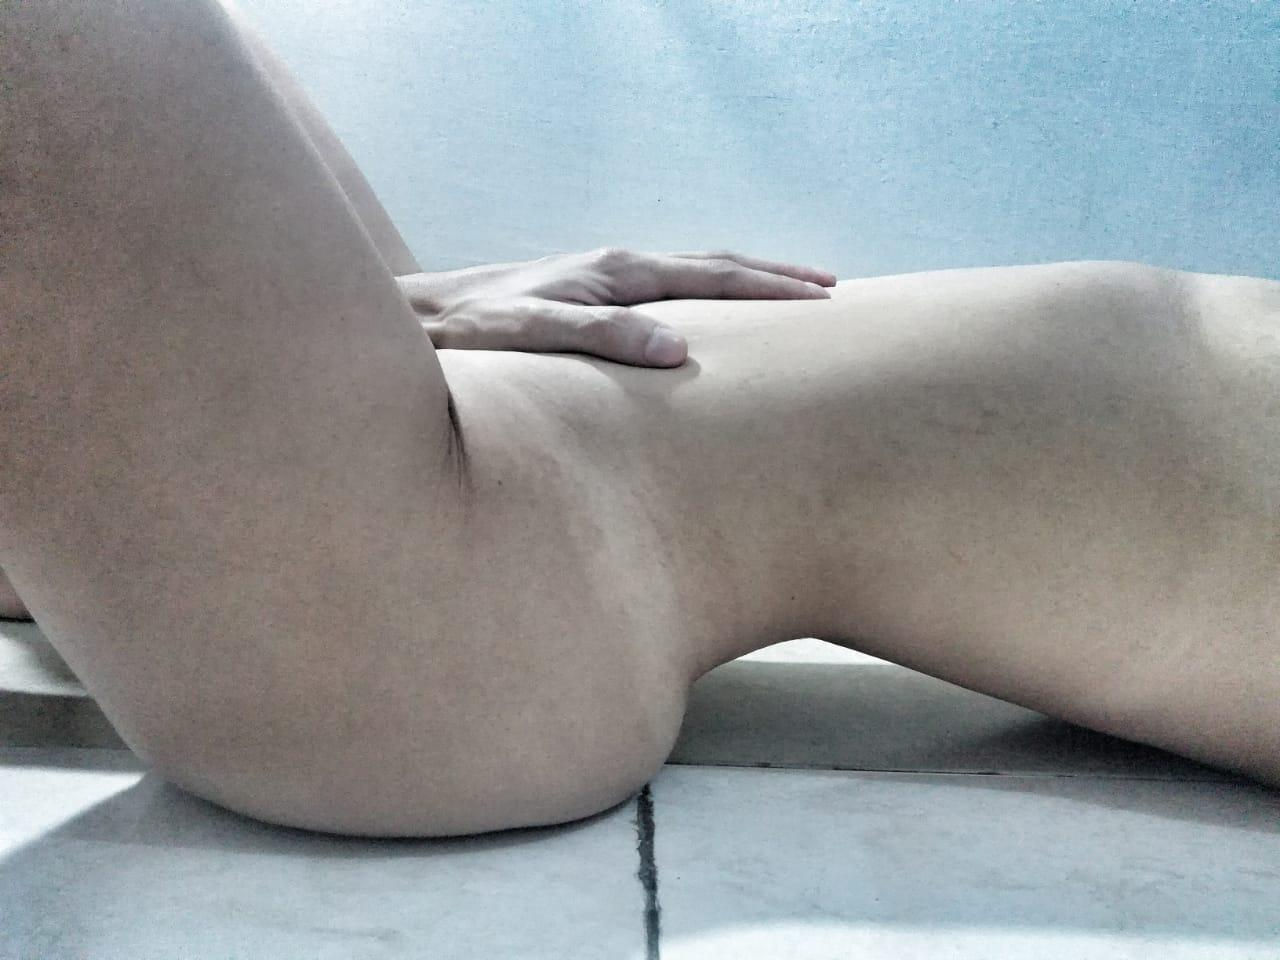 Sex horny?s=uvneobrk4qhlqixi96g+9sbefdqerup1skkqxzcnp5w=